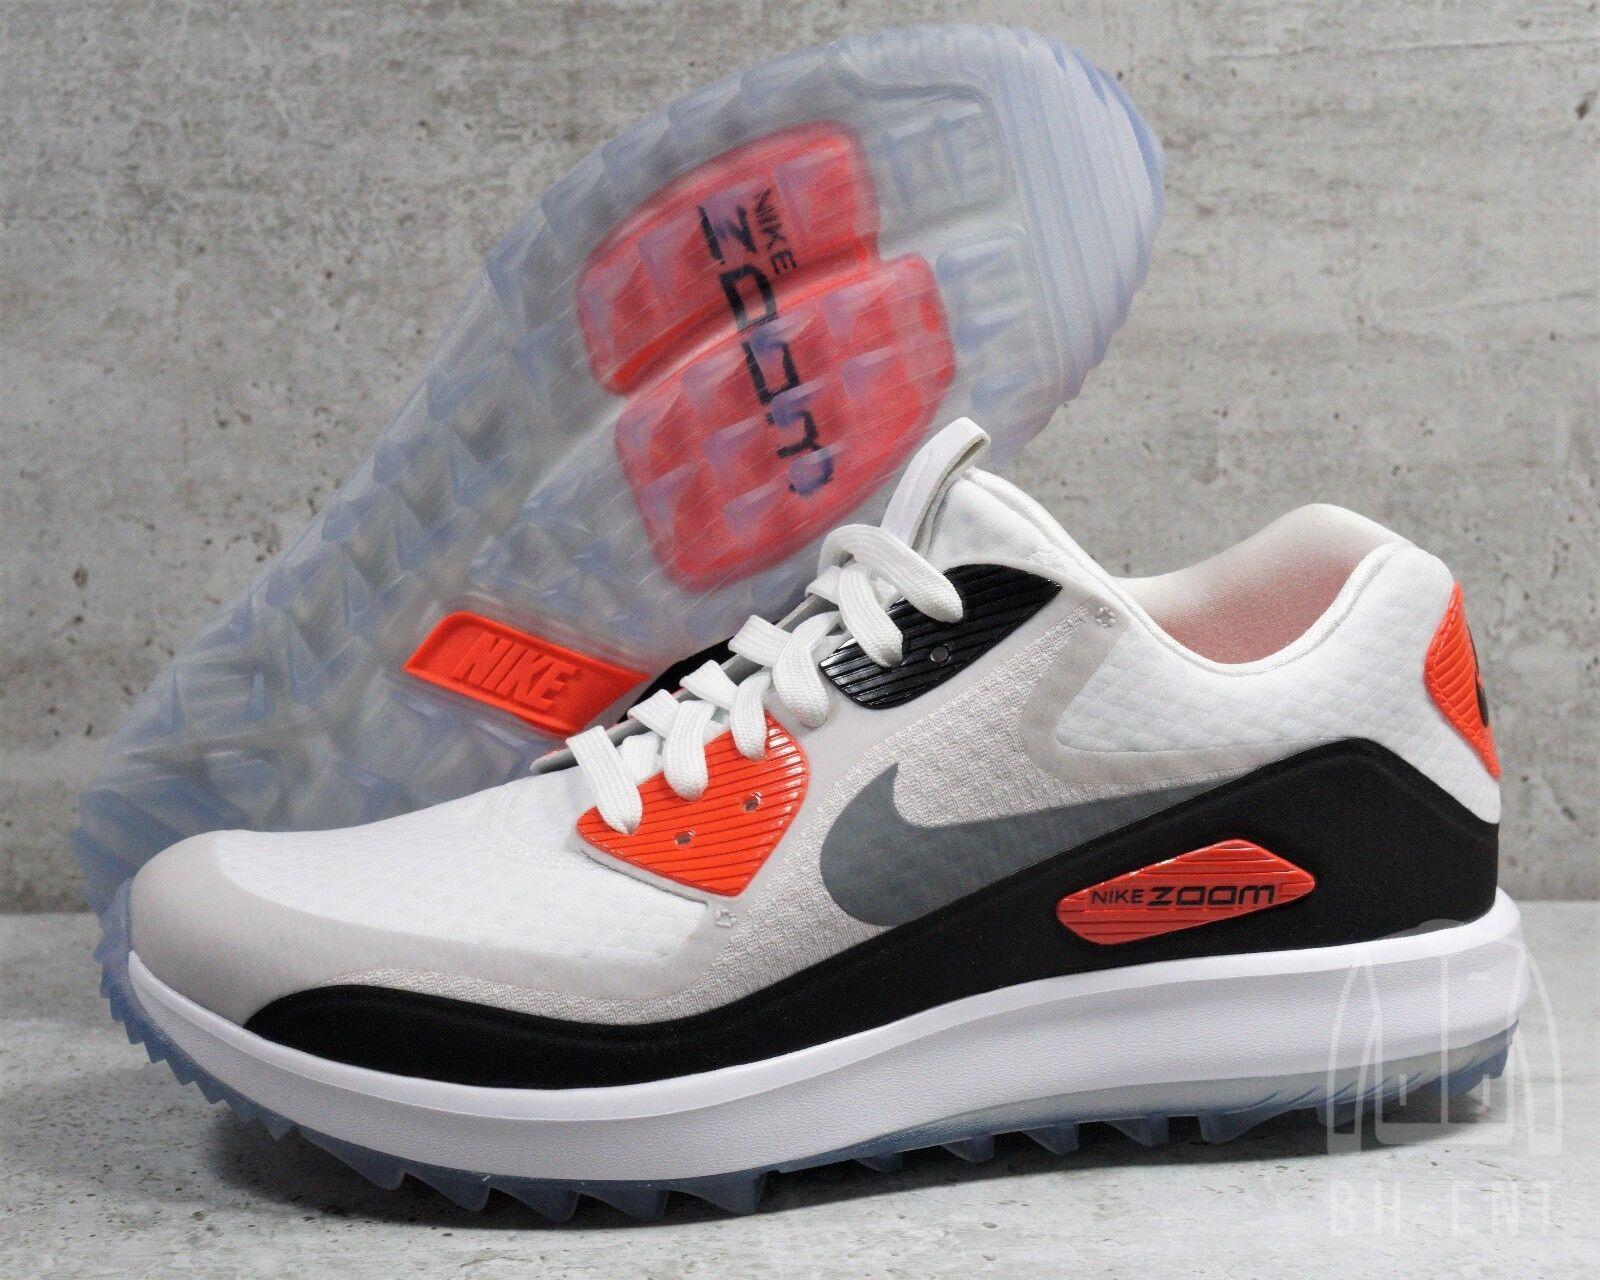 Nike Air Max Zoom 90 IT golf cipők Fehér infravörös RORY MCILROY SZ 8.5